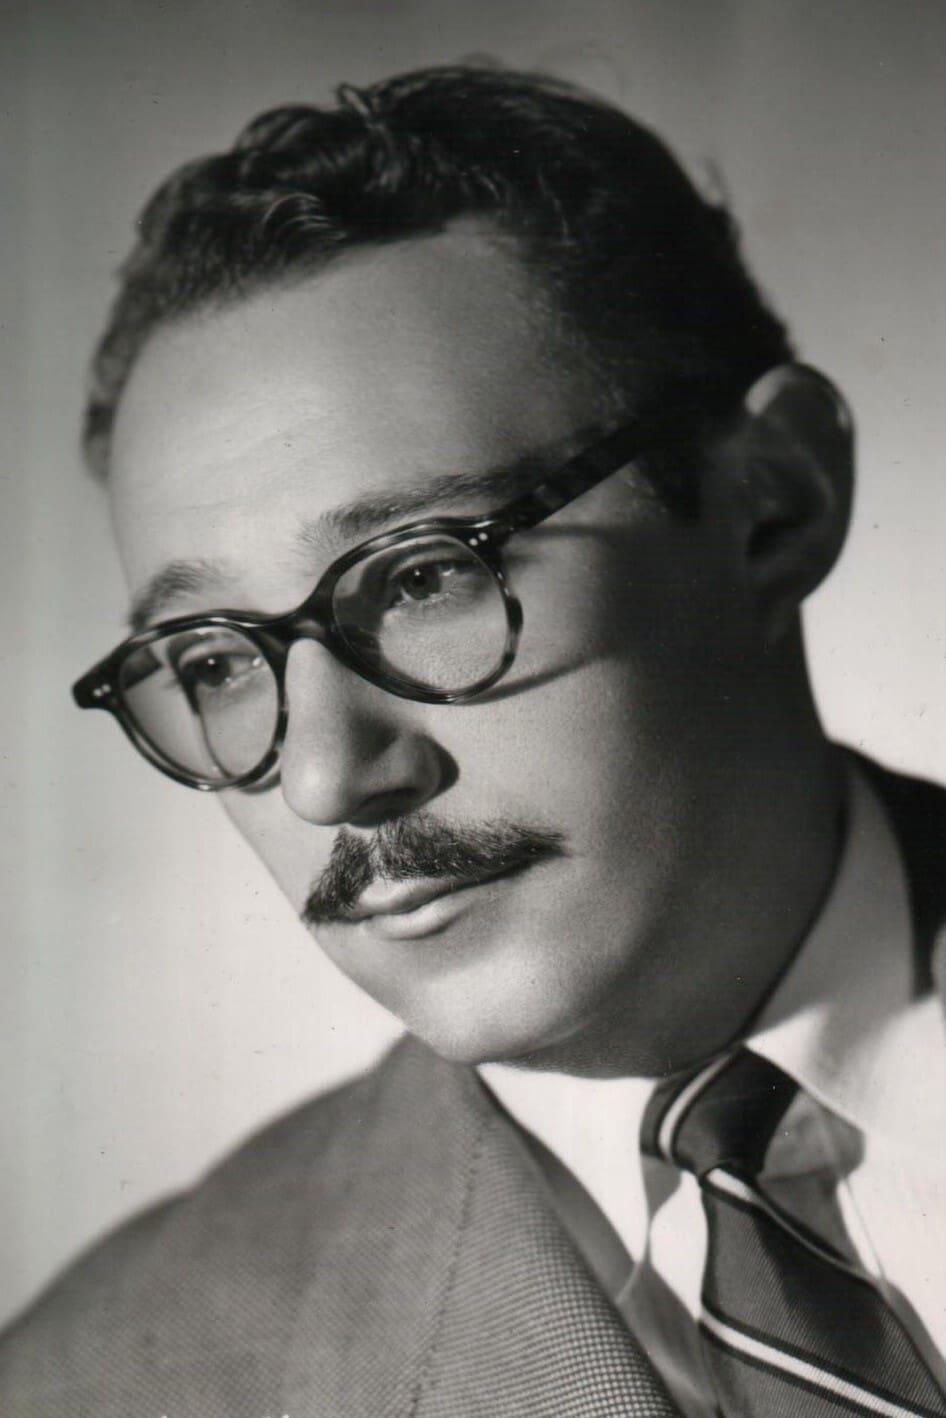 Carlos Riquelme